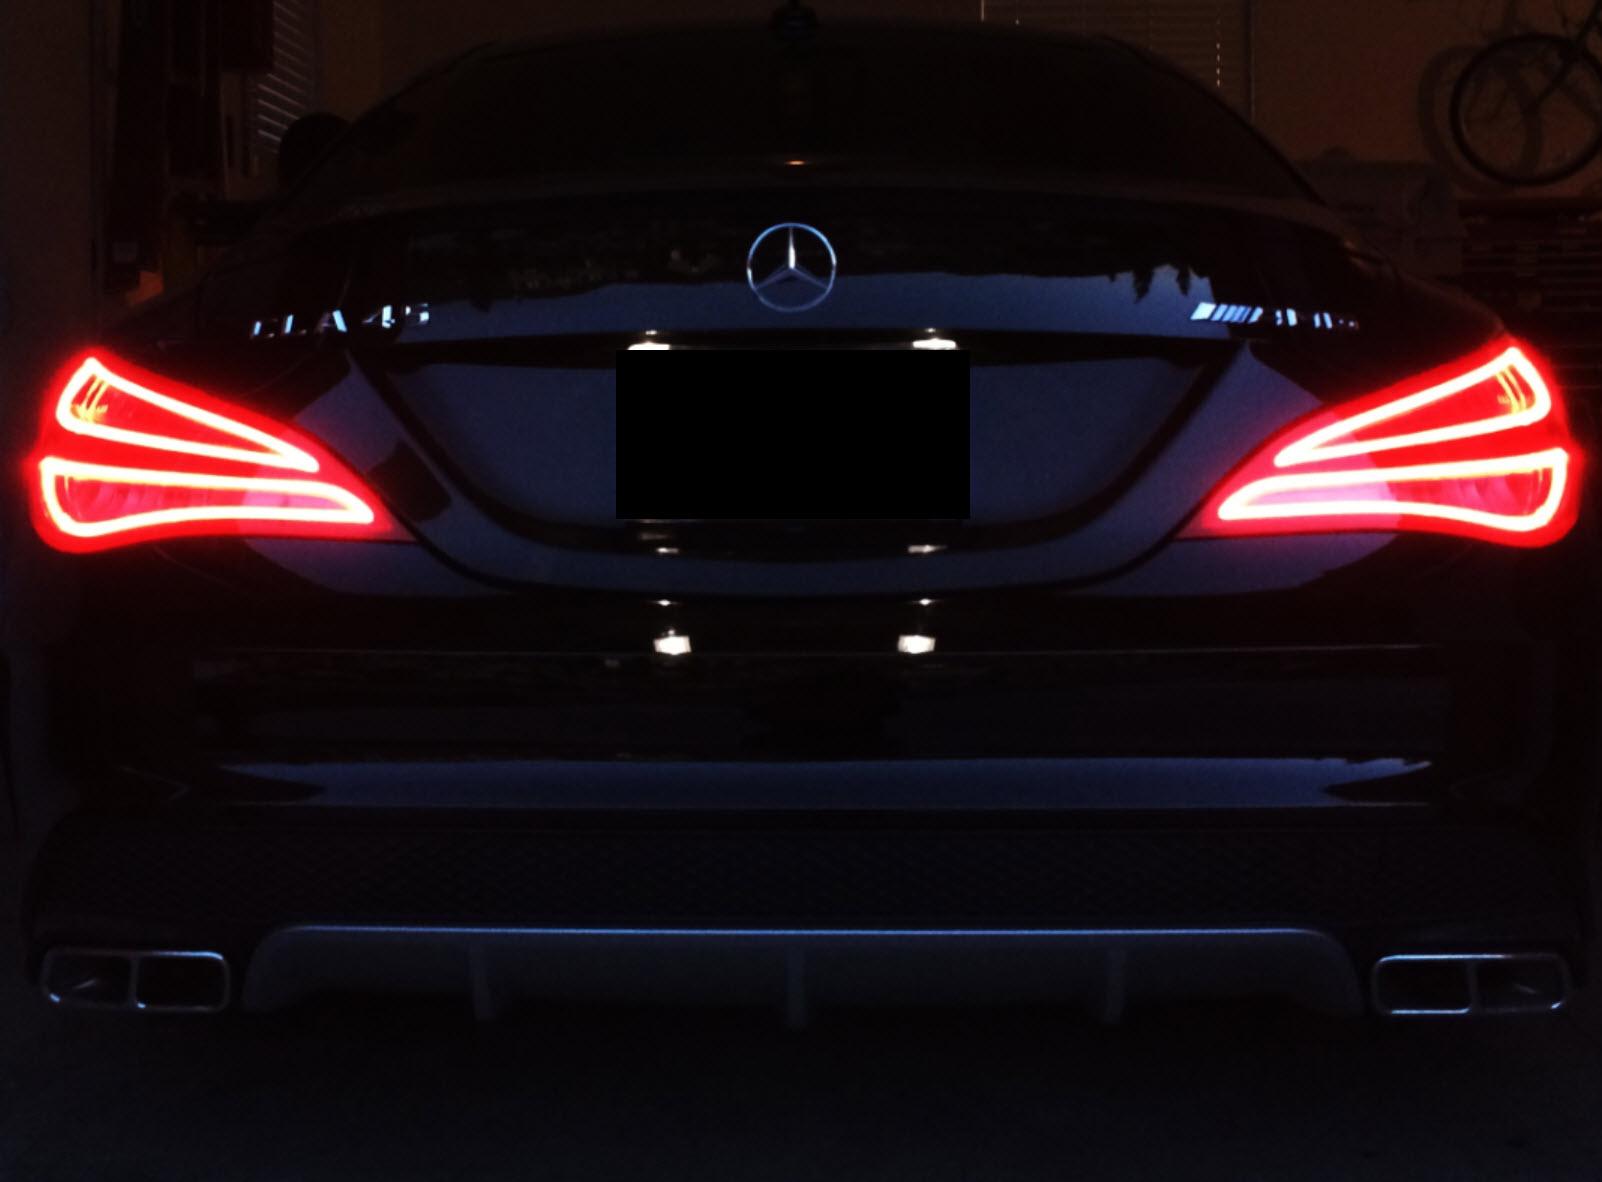 Led Lights For Motorcycle >> CLA 250 Fiber Optic LED Tail Lights